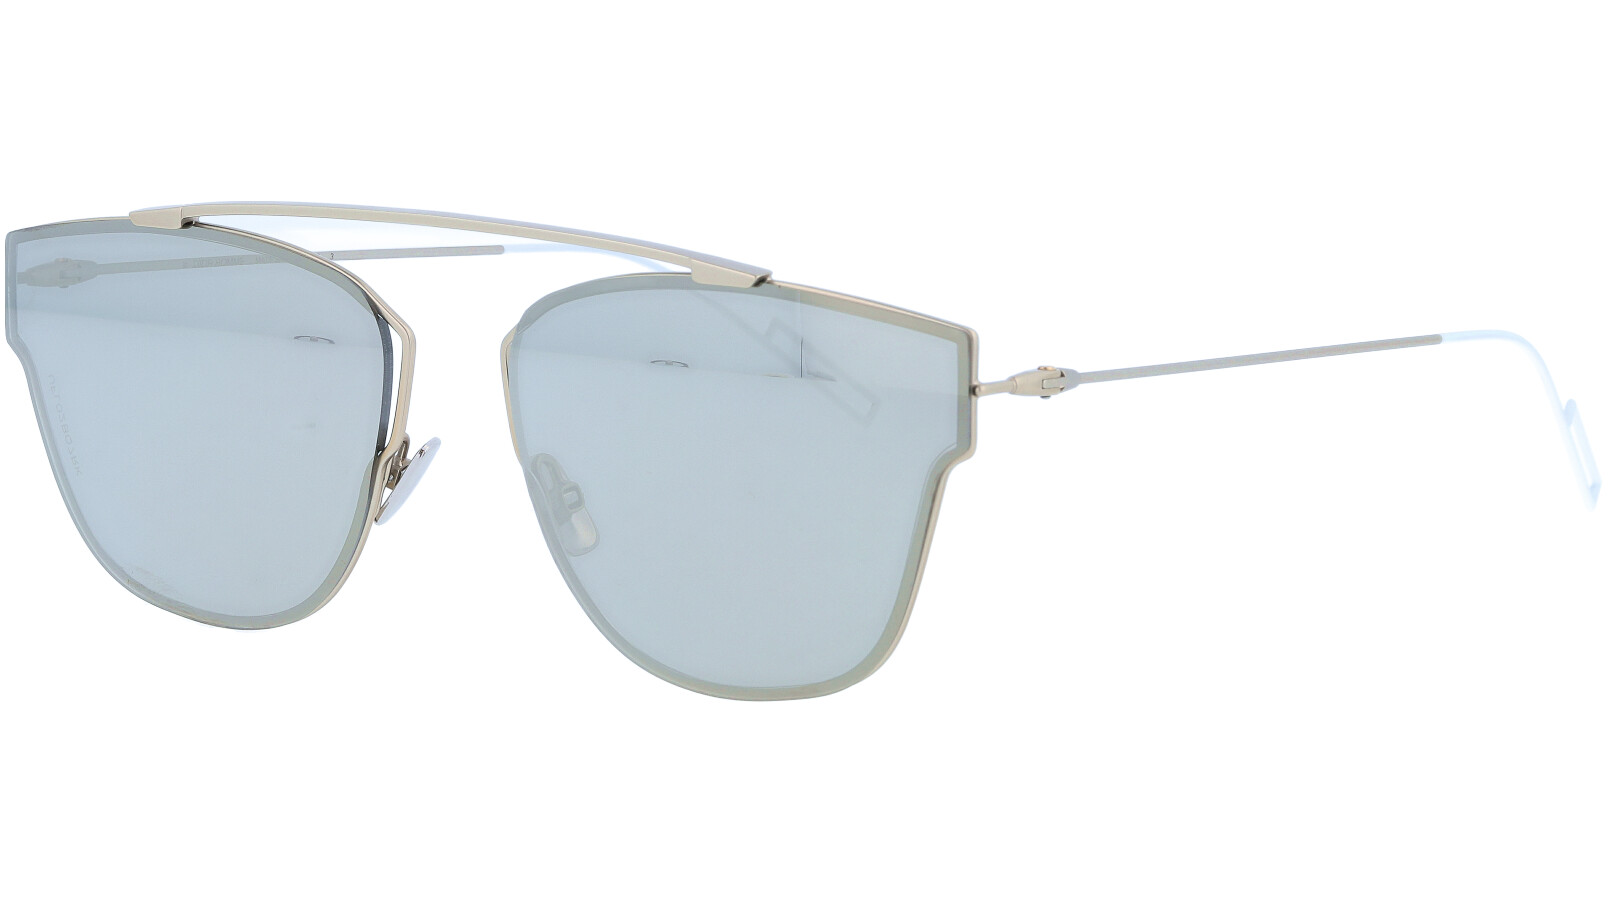 Dior 0204S CGSM3 57 LTGLD Sunglasses